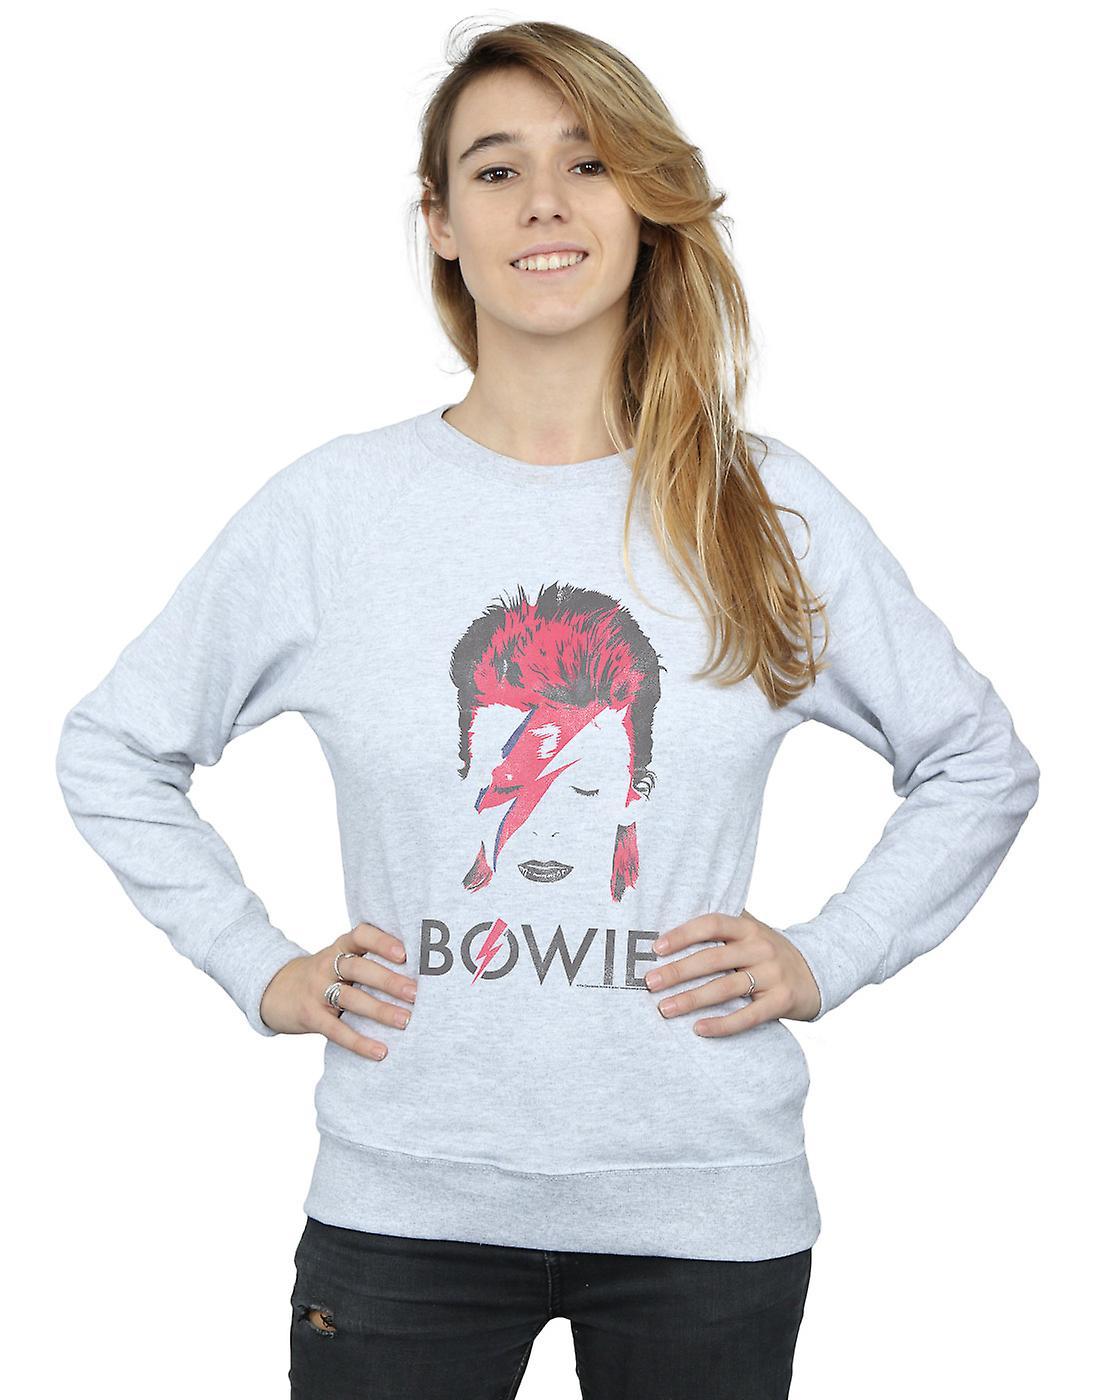 David Bowie Women's Aladdin Sane Distressed Sweatshirt